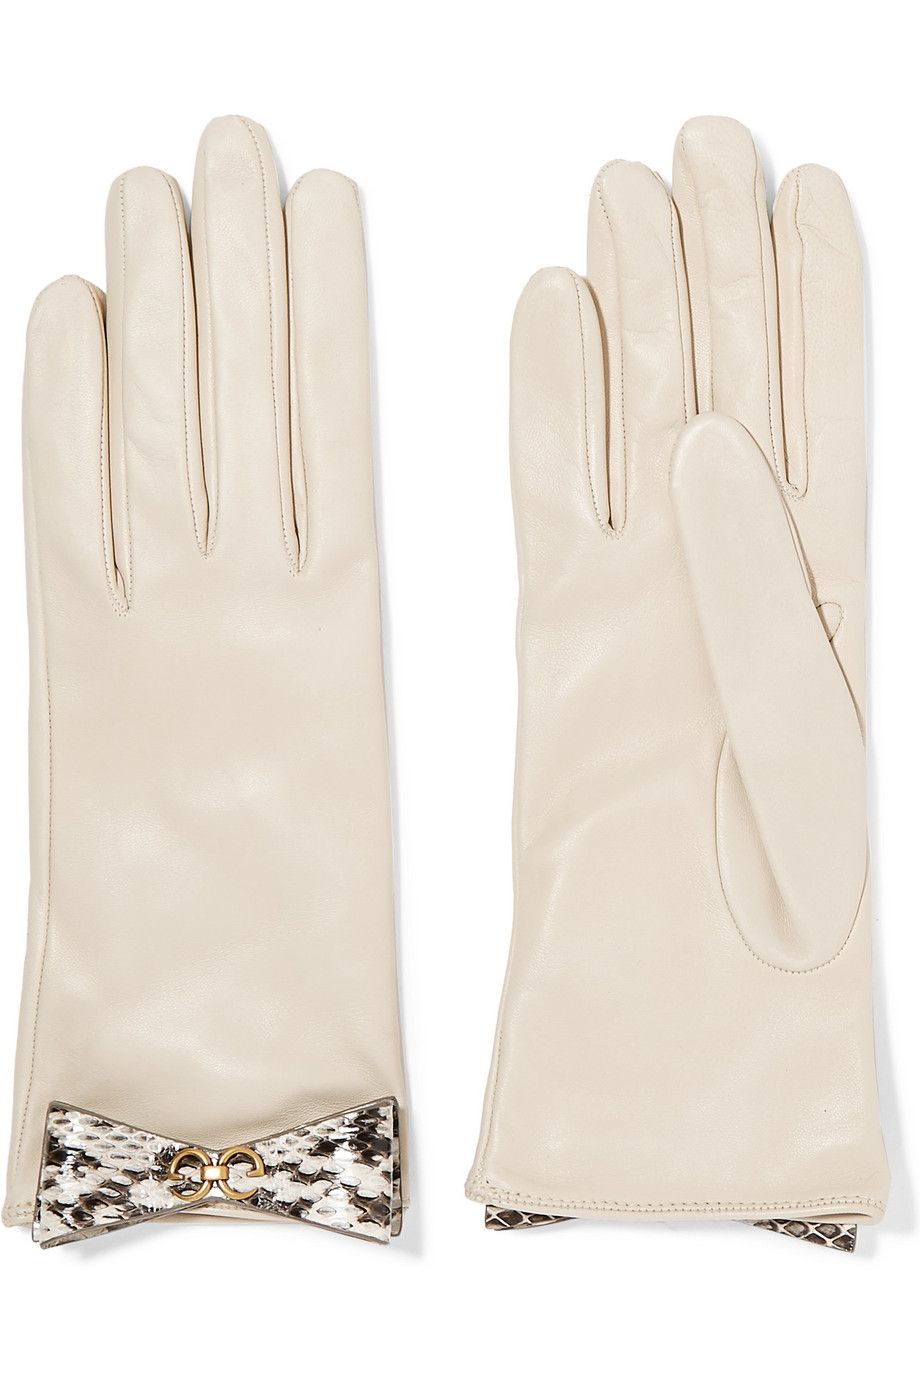 Evening-Gloves-1117